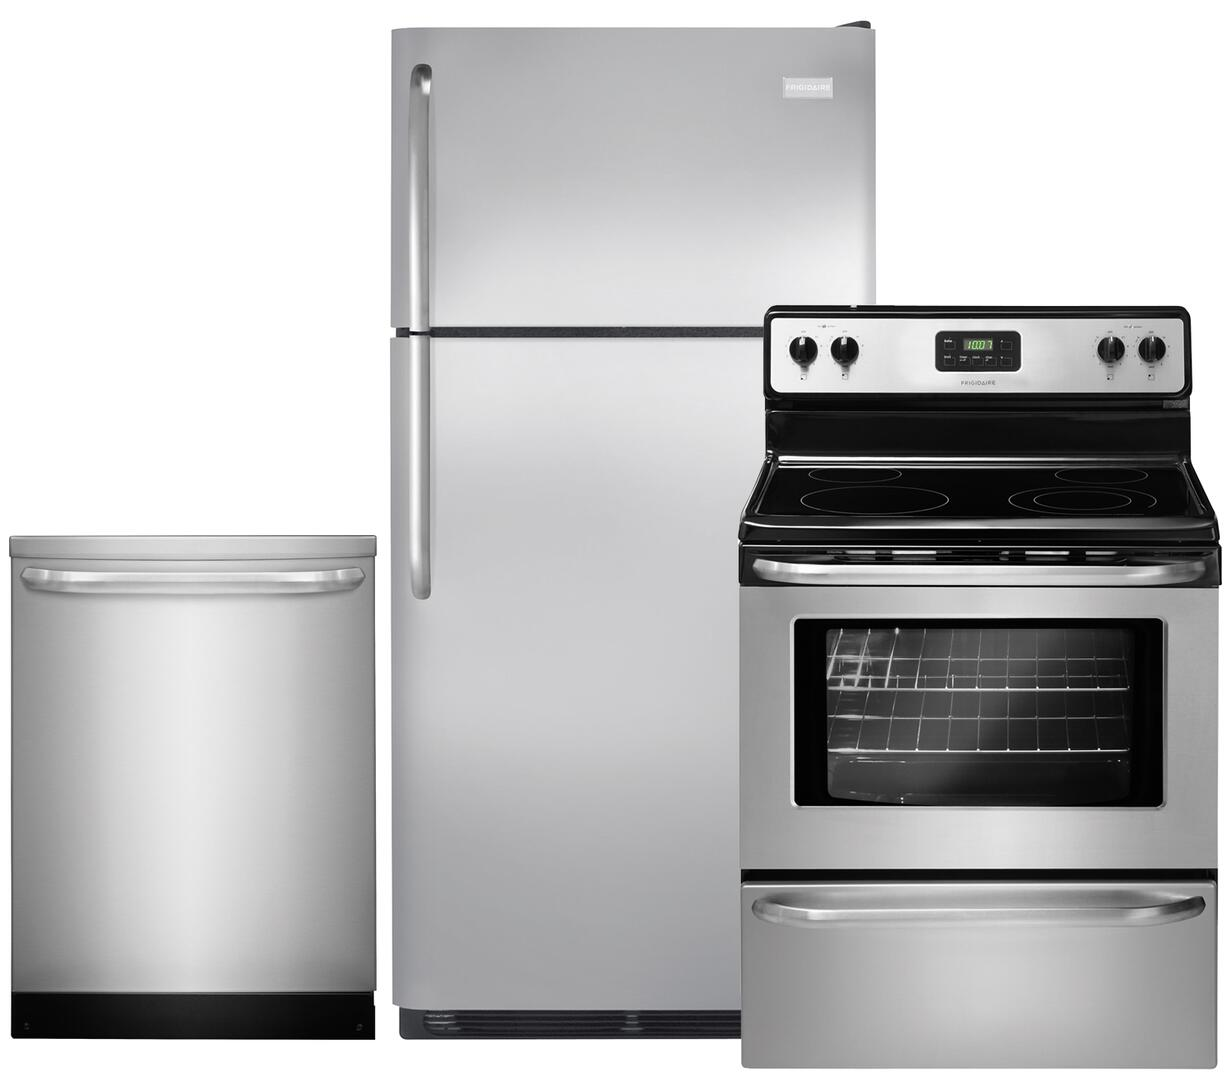 frigidaire kitchen appliances backsplash for white 655891 appliance packages